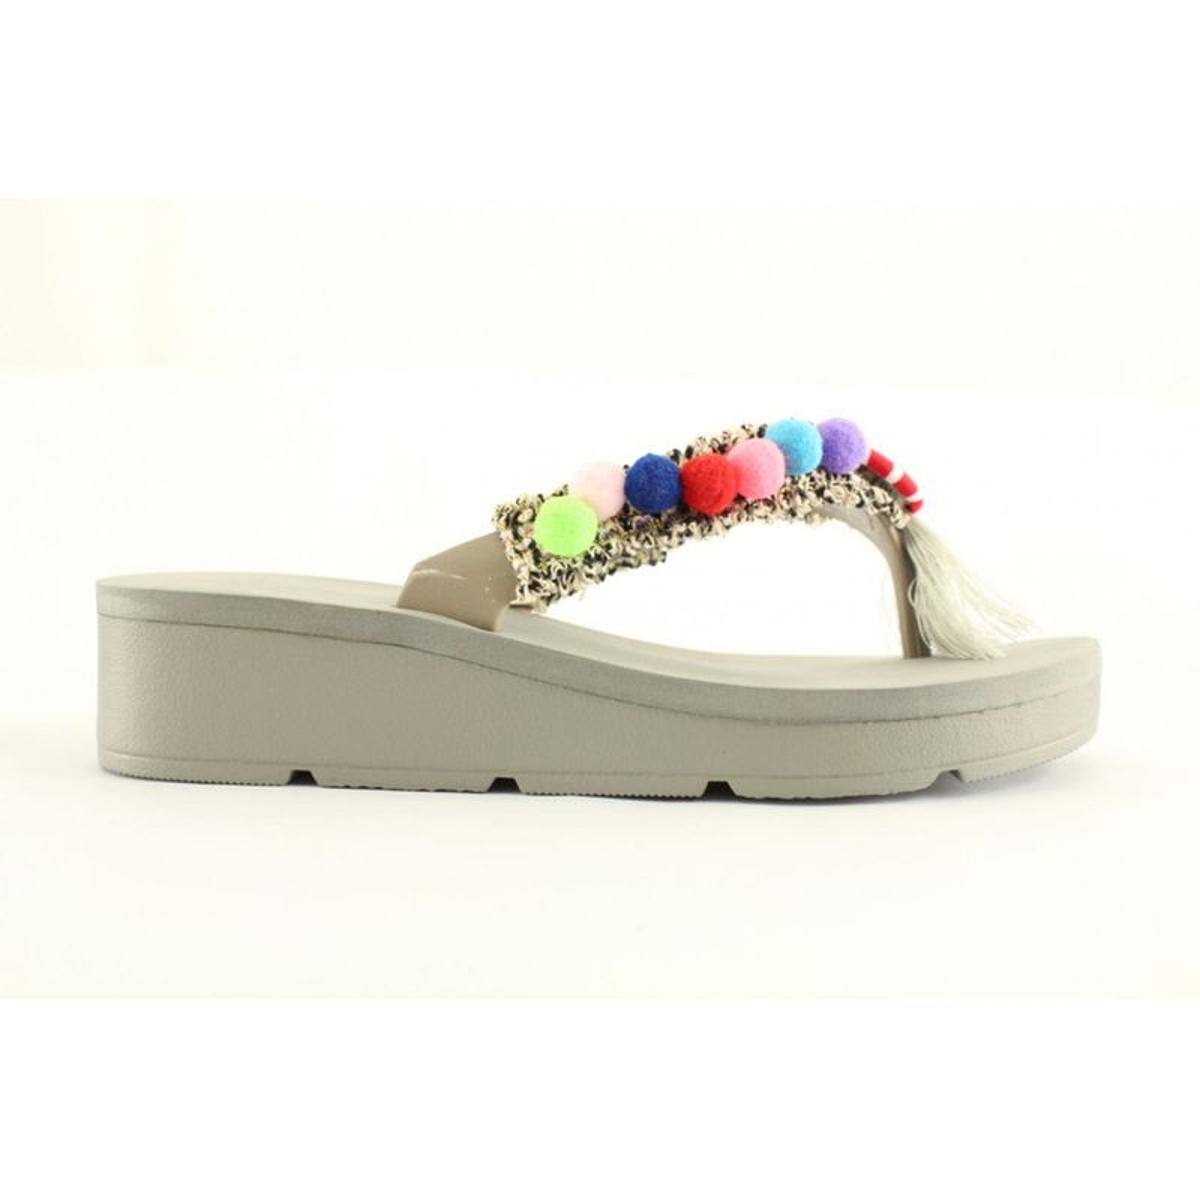 Sandales nu-pieds à plateforme Kamoa